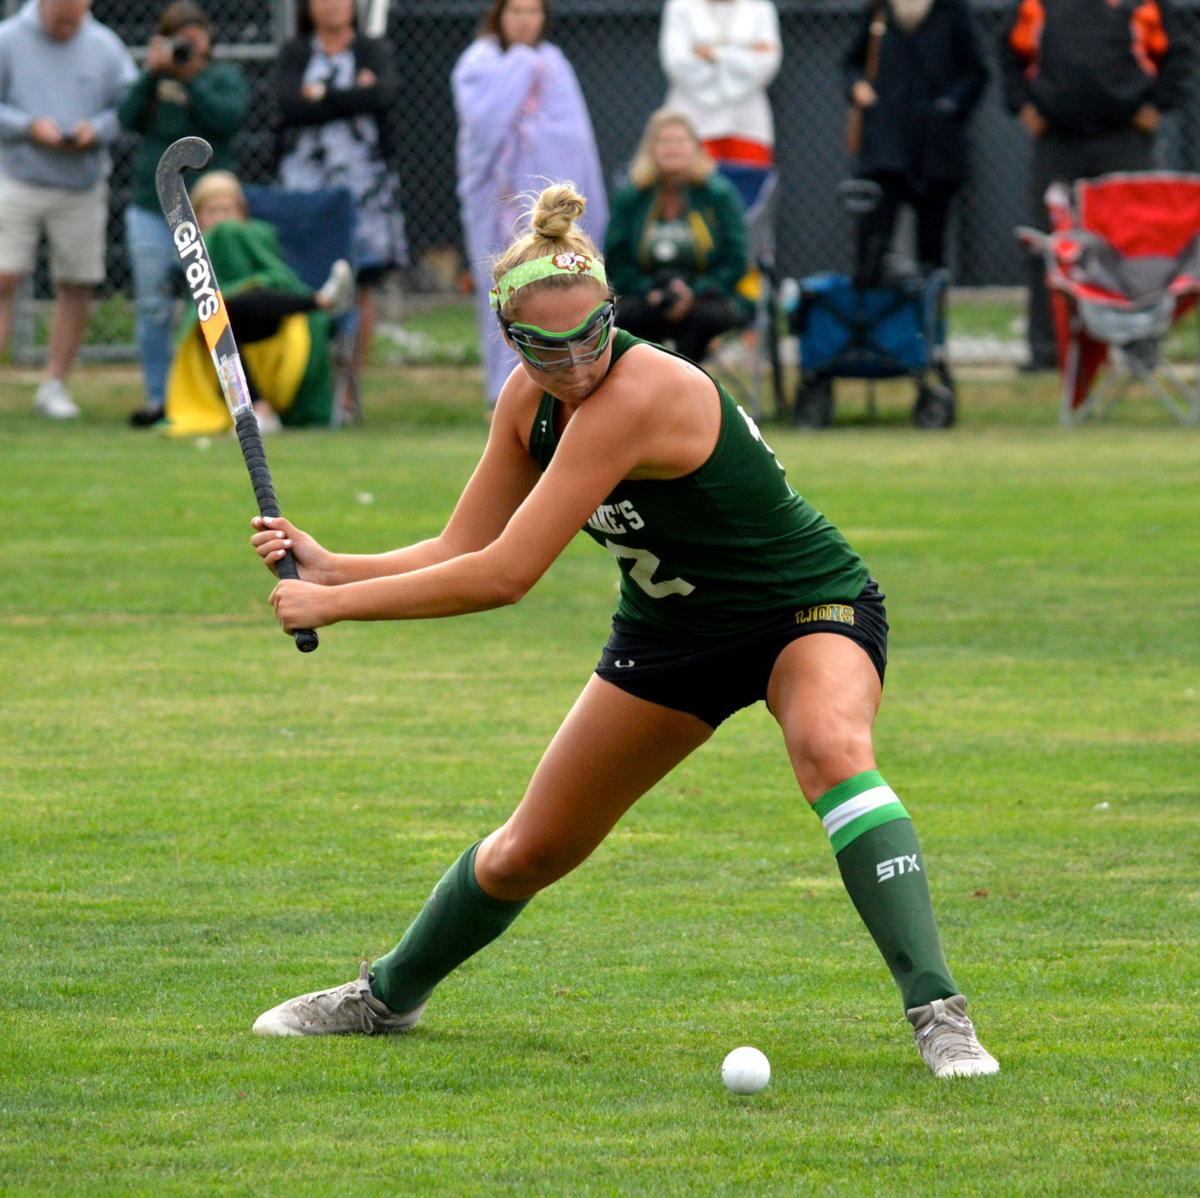 High School Field Hockey: Queen Anne's at Easton